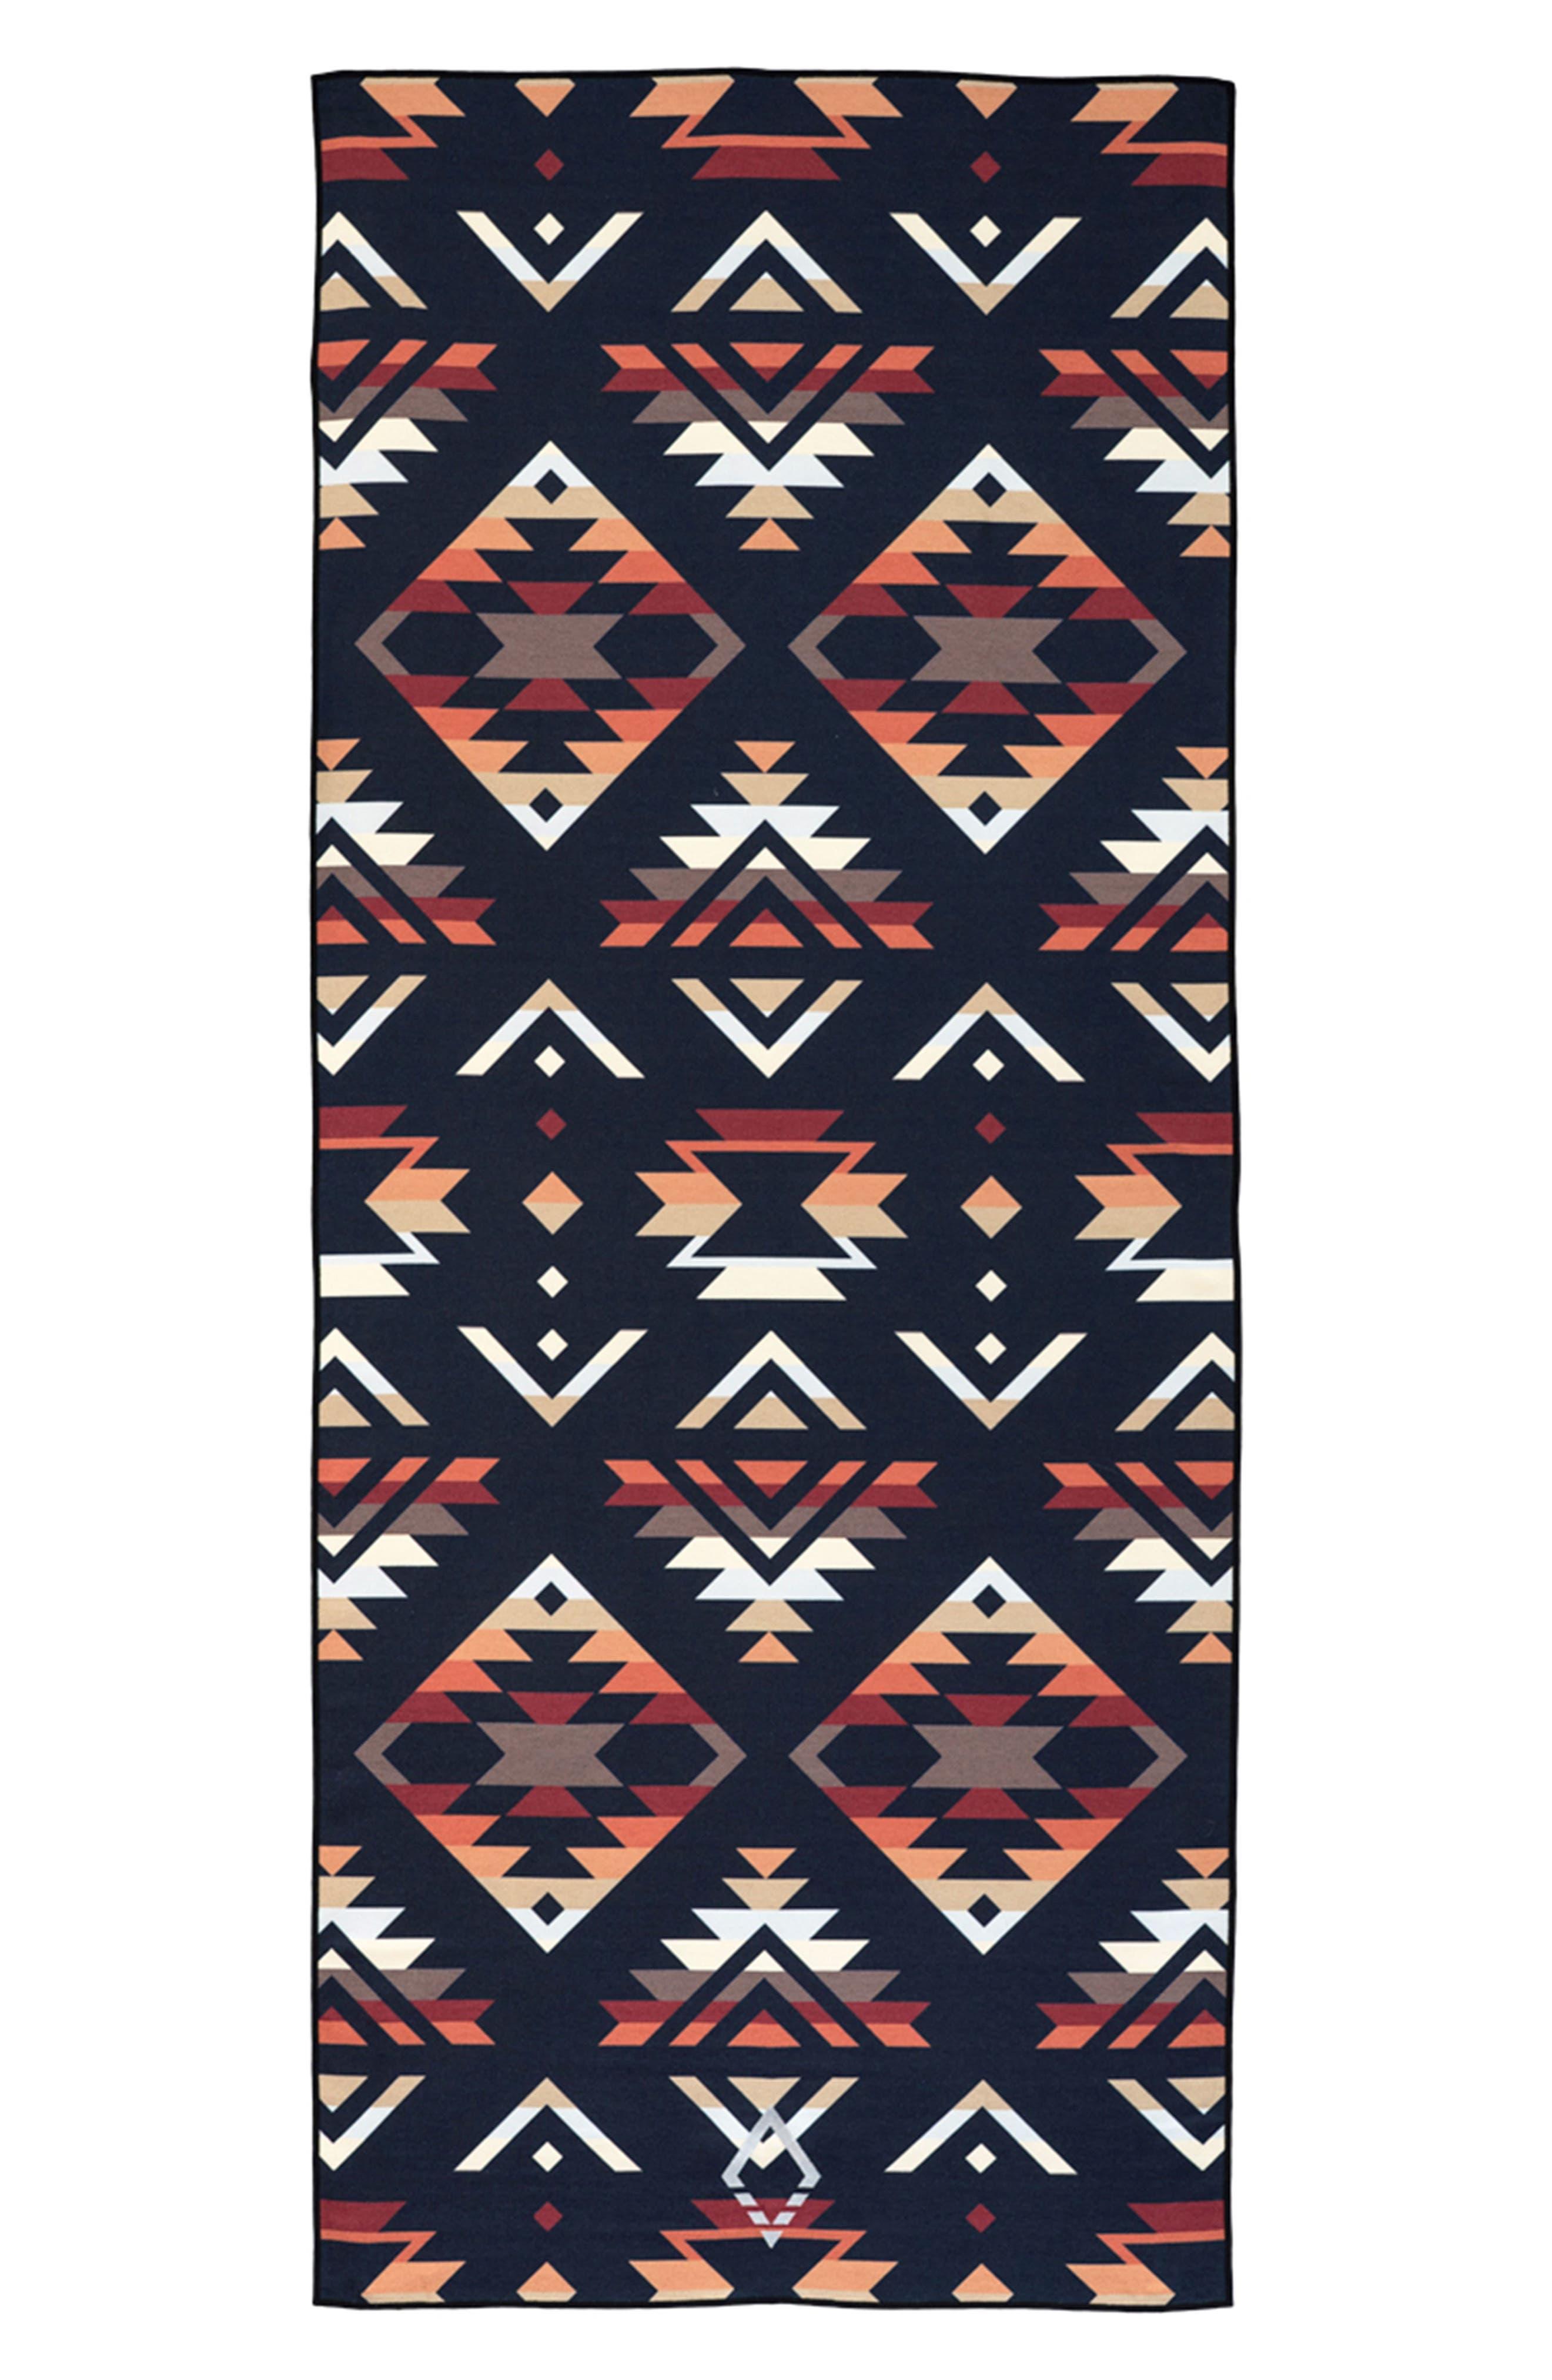 PNW Yoga Towel,                             Main thumbnail 1, color,                             400